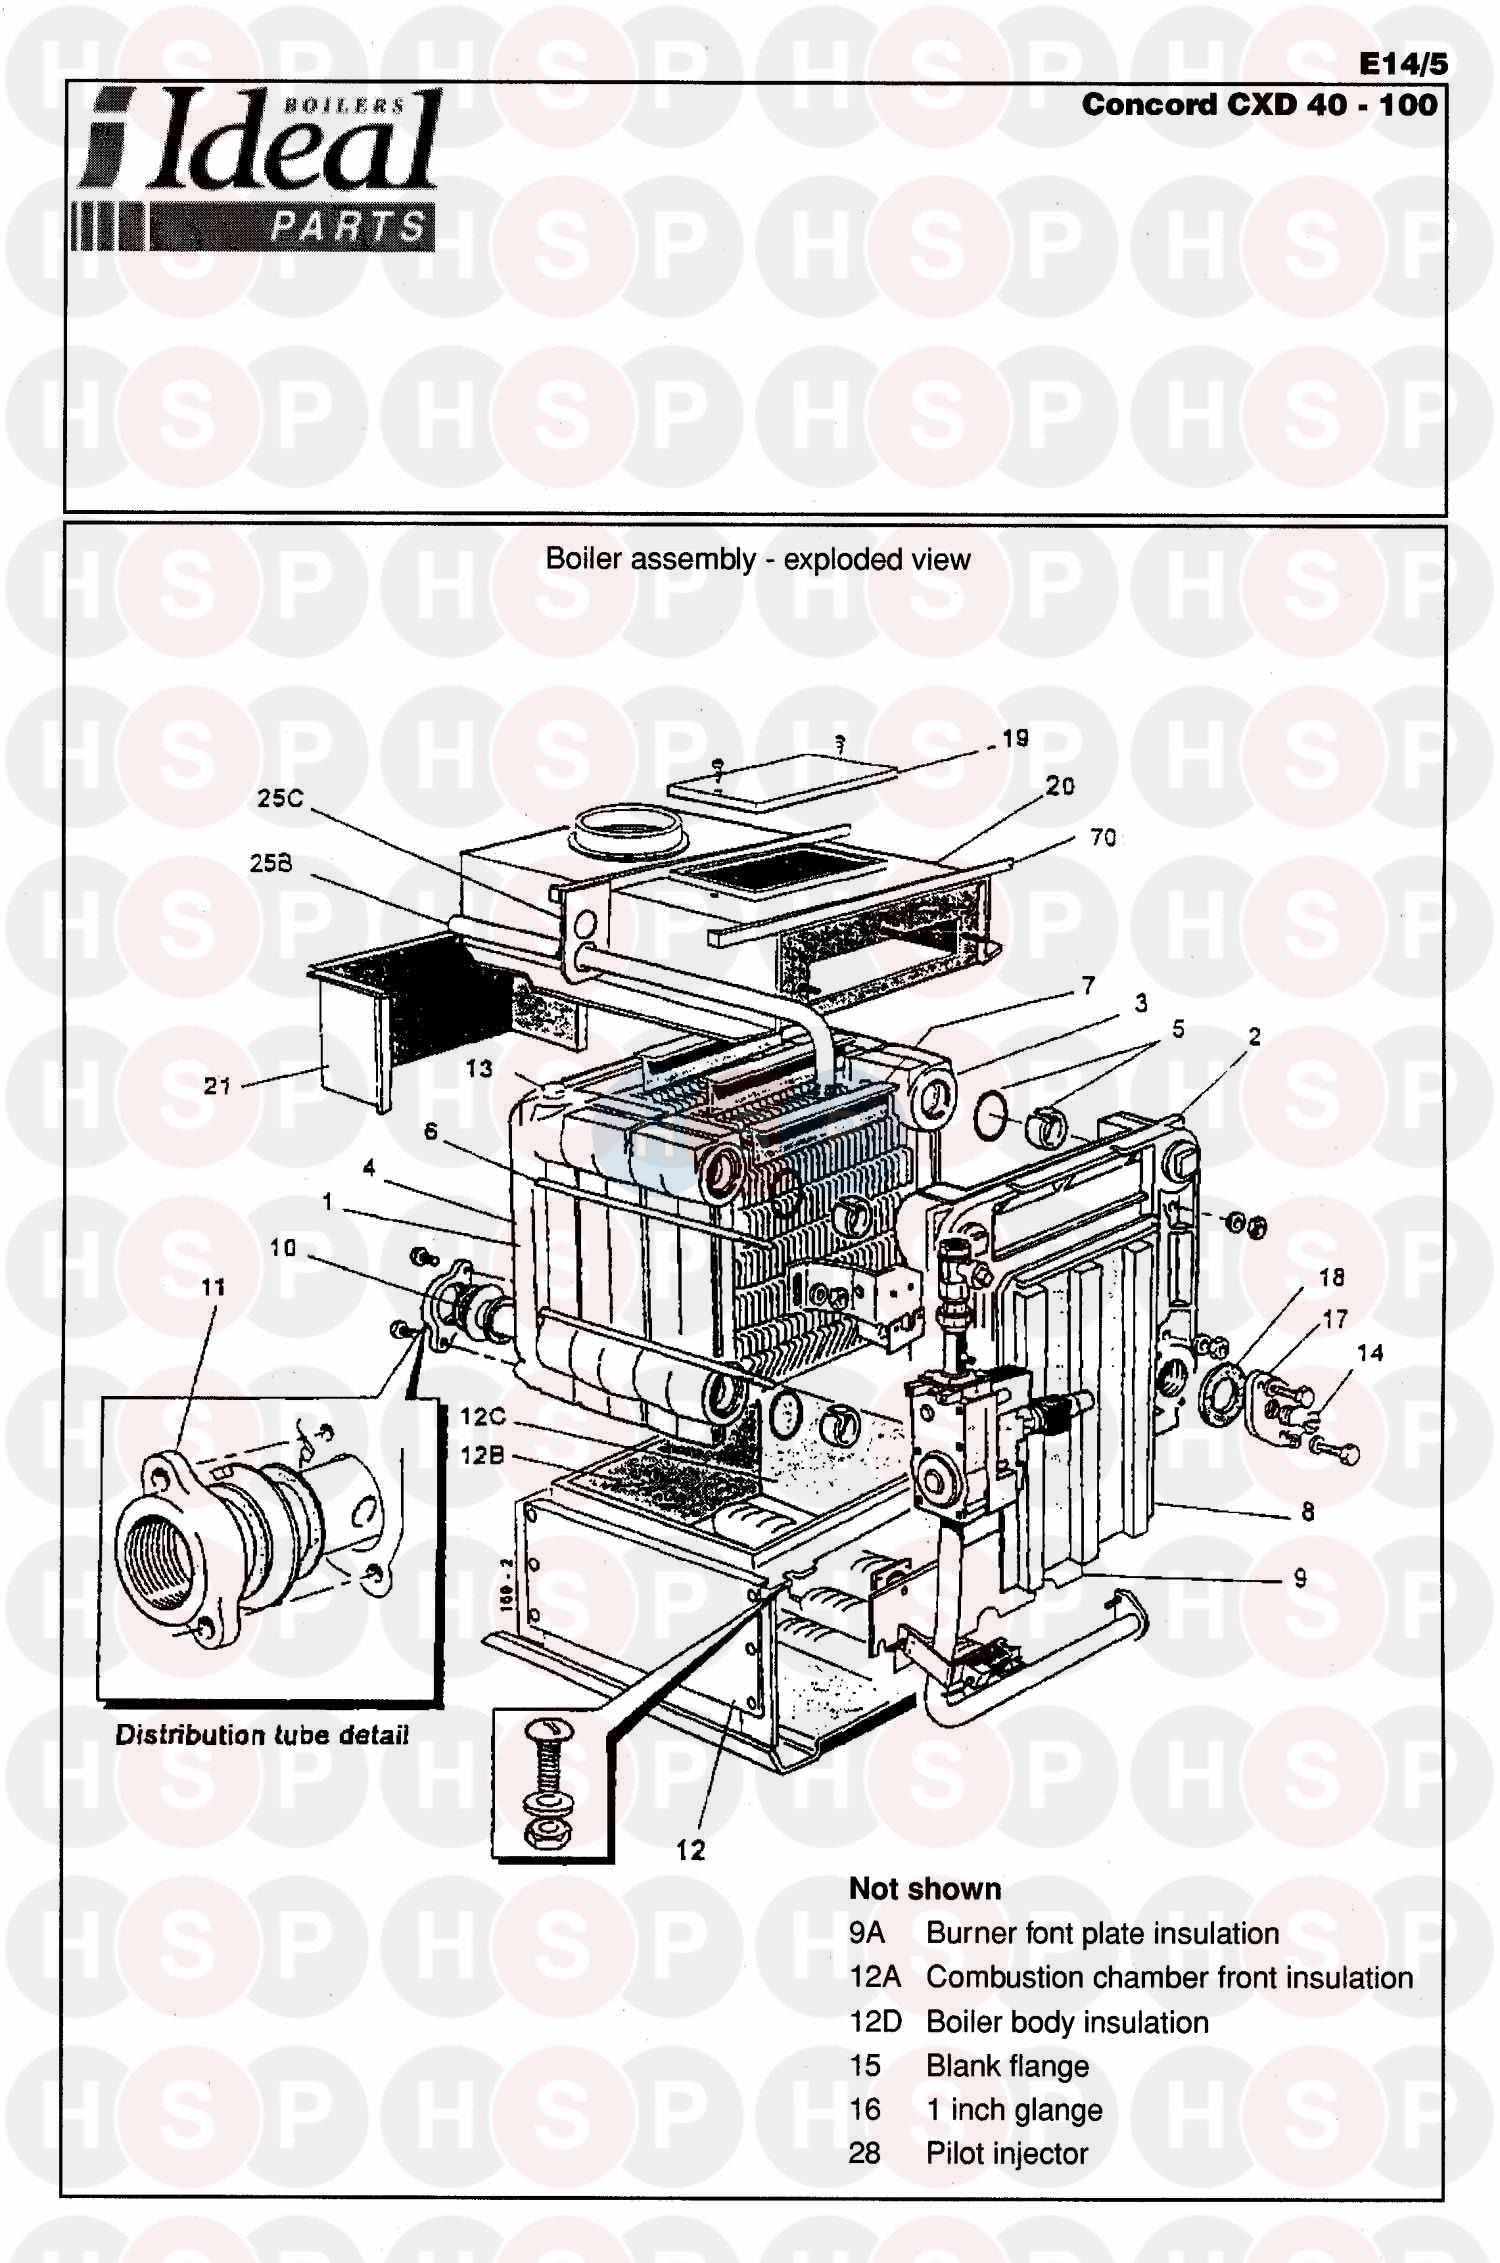 ideal concord cxd 3 90 boiler assembly 1 diagram. Black Bedroom Furniture Sets. Home Design Ideas